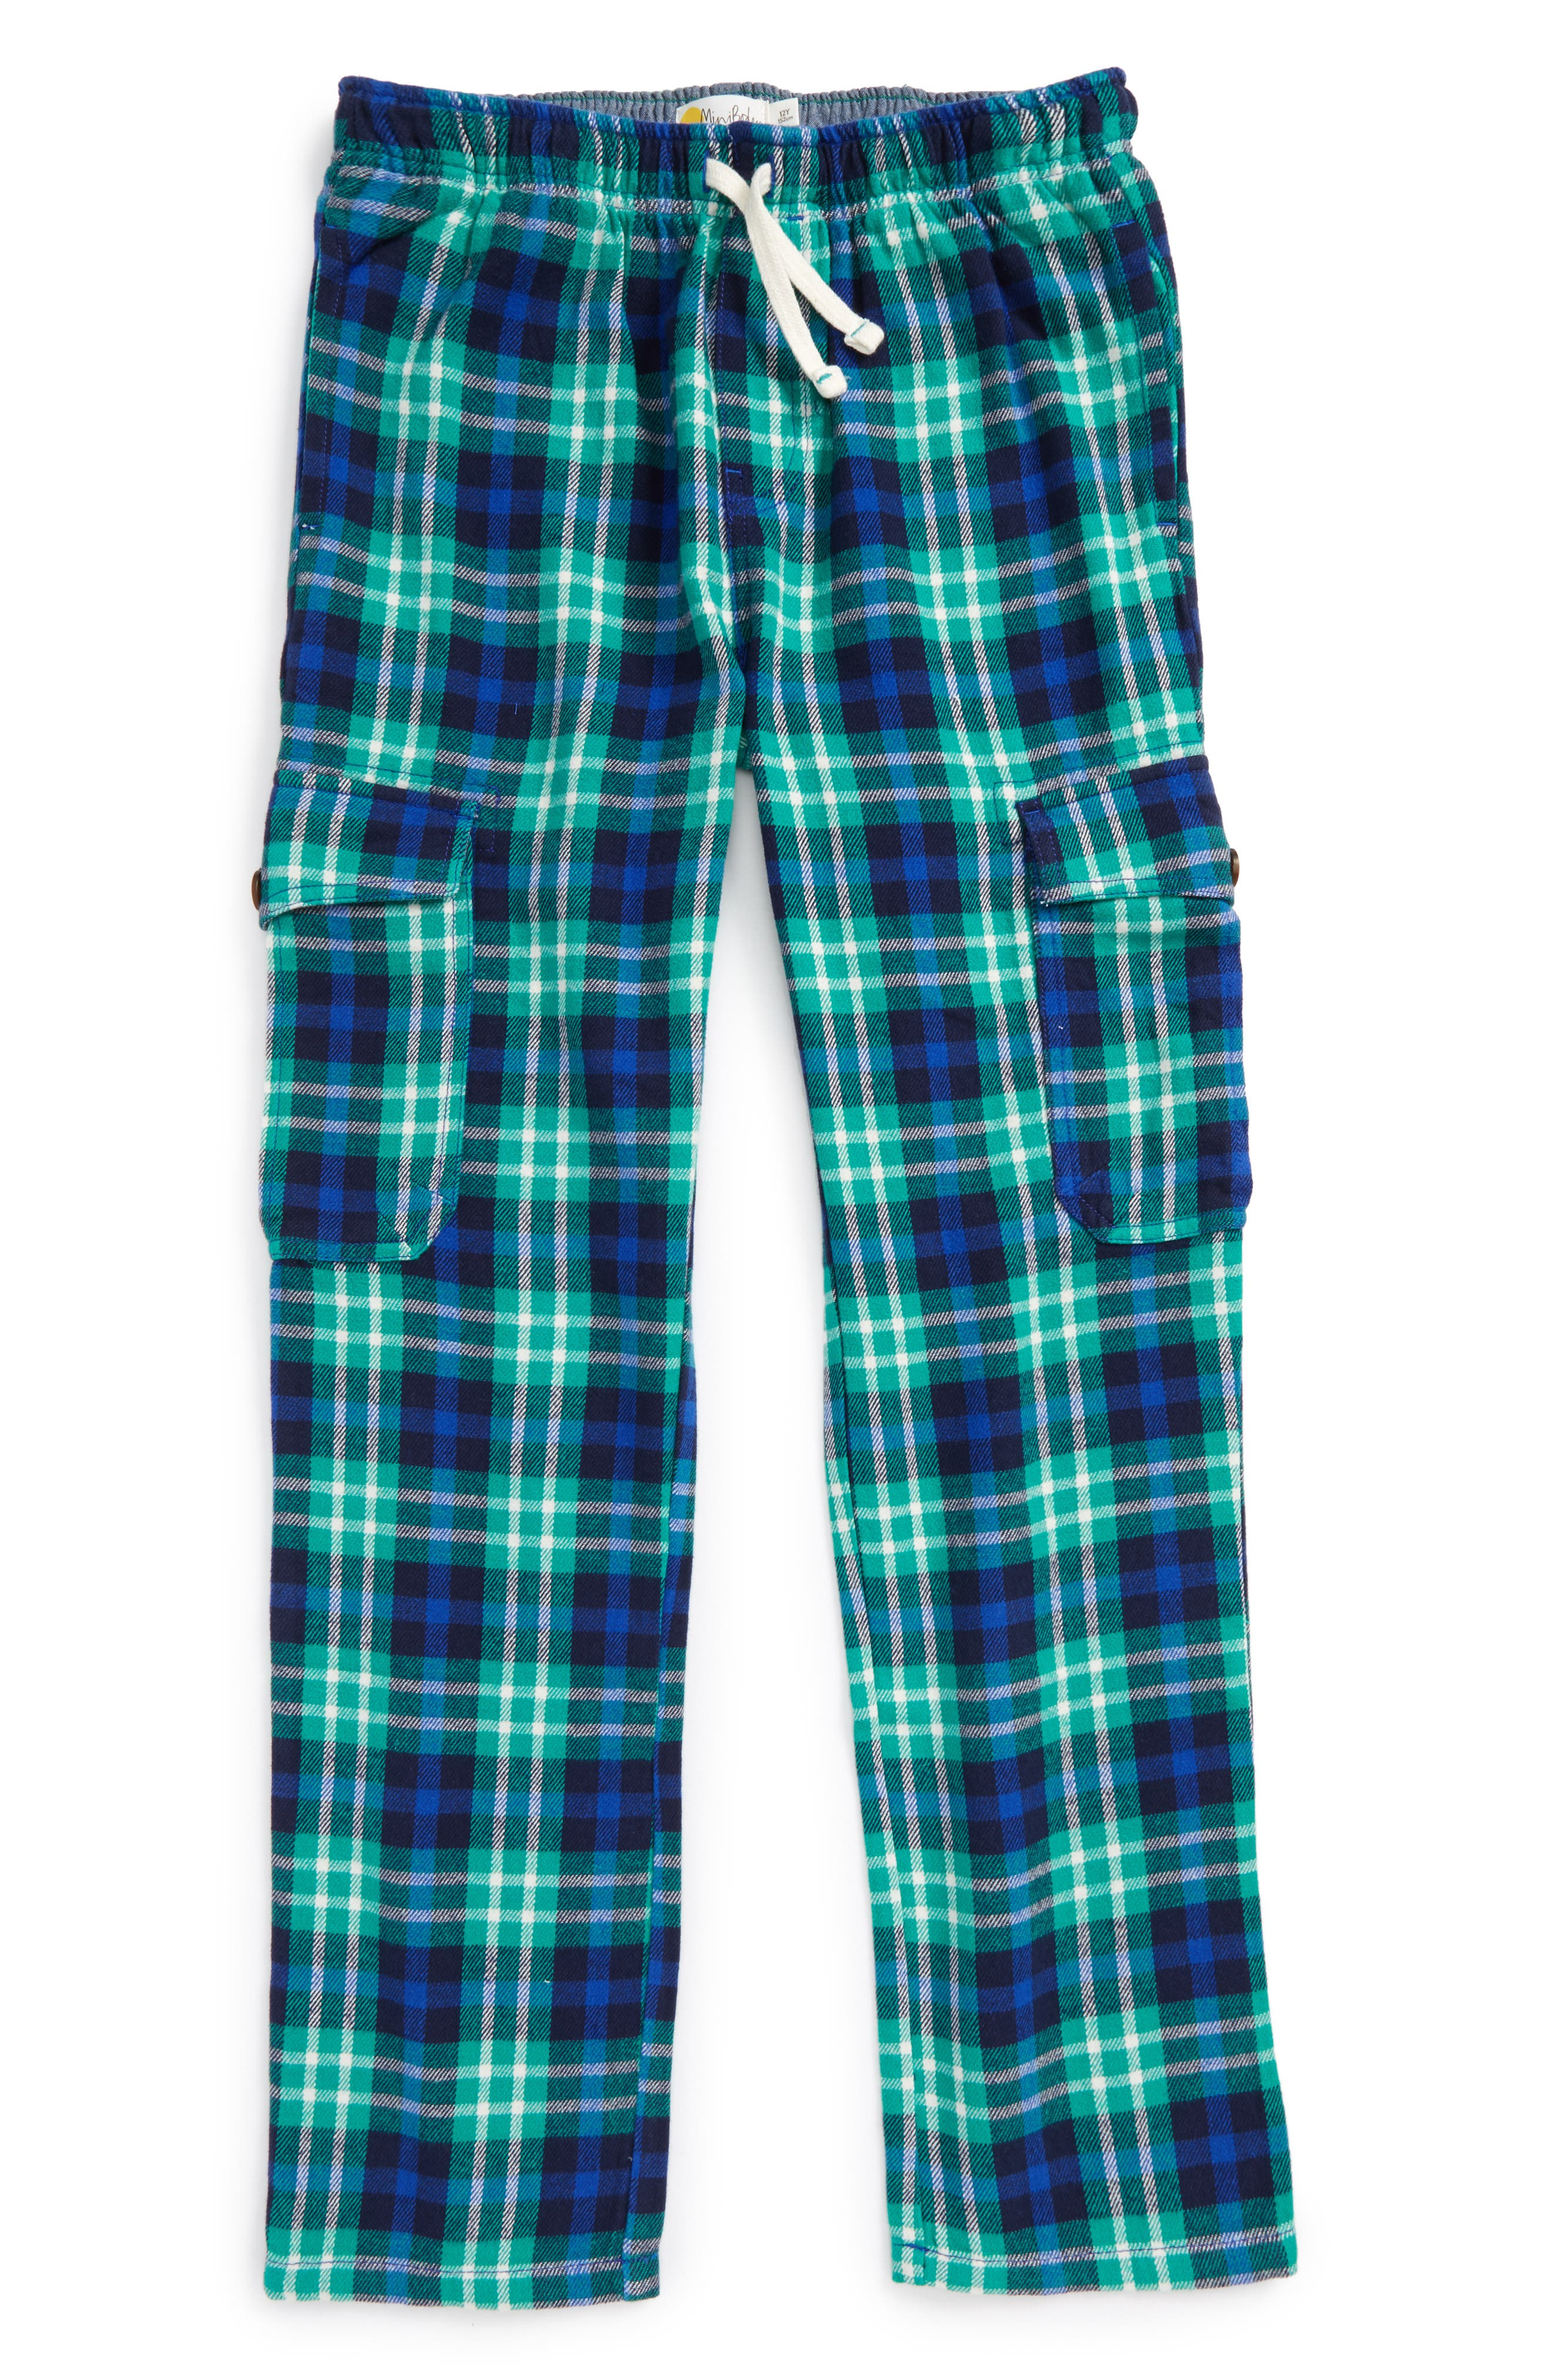 Alternate Image 1 Selected - Mini Boden Brushed Tartan Cargo Pants (Toddler Boys, Little Boys & Big Boys)